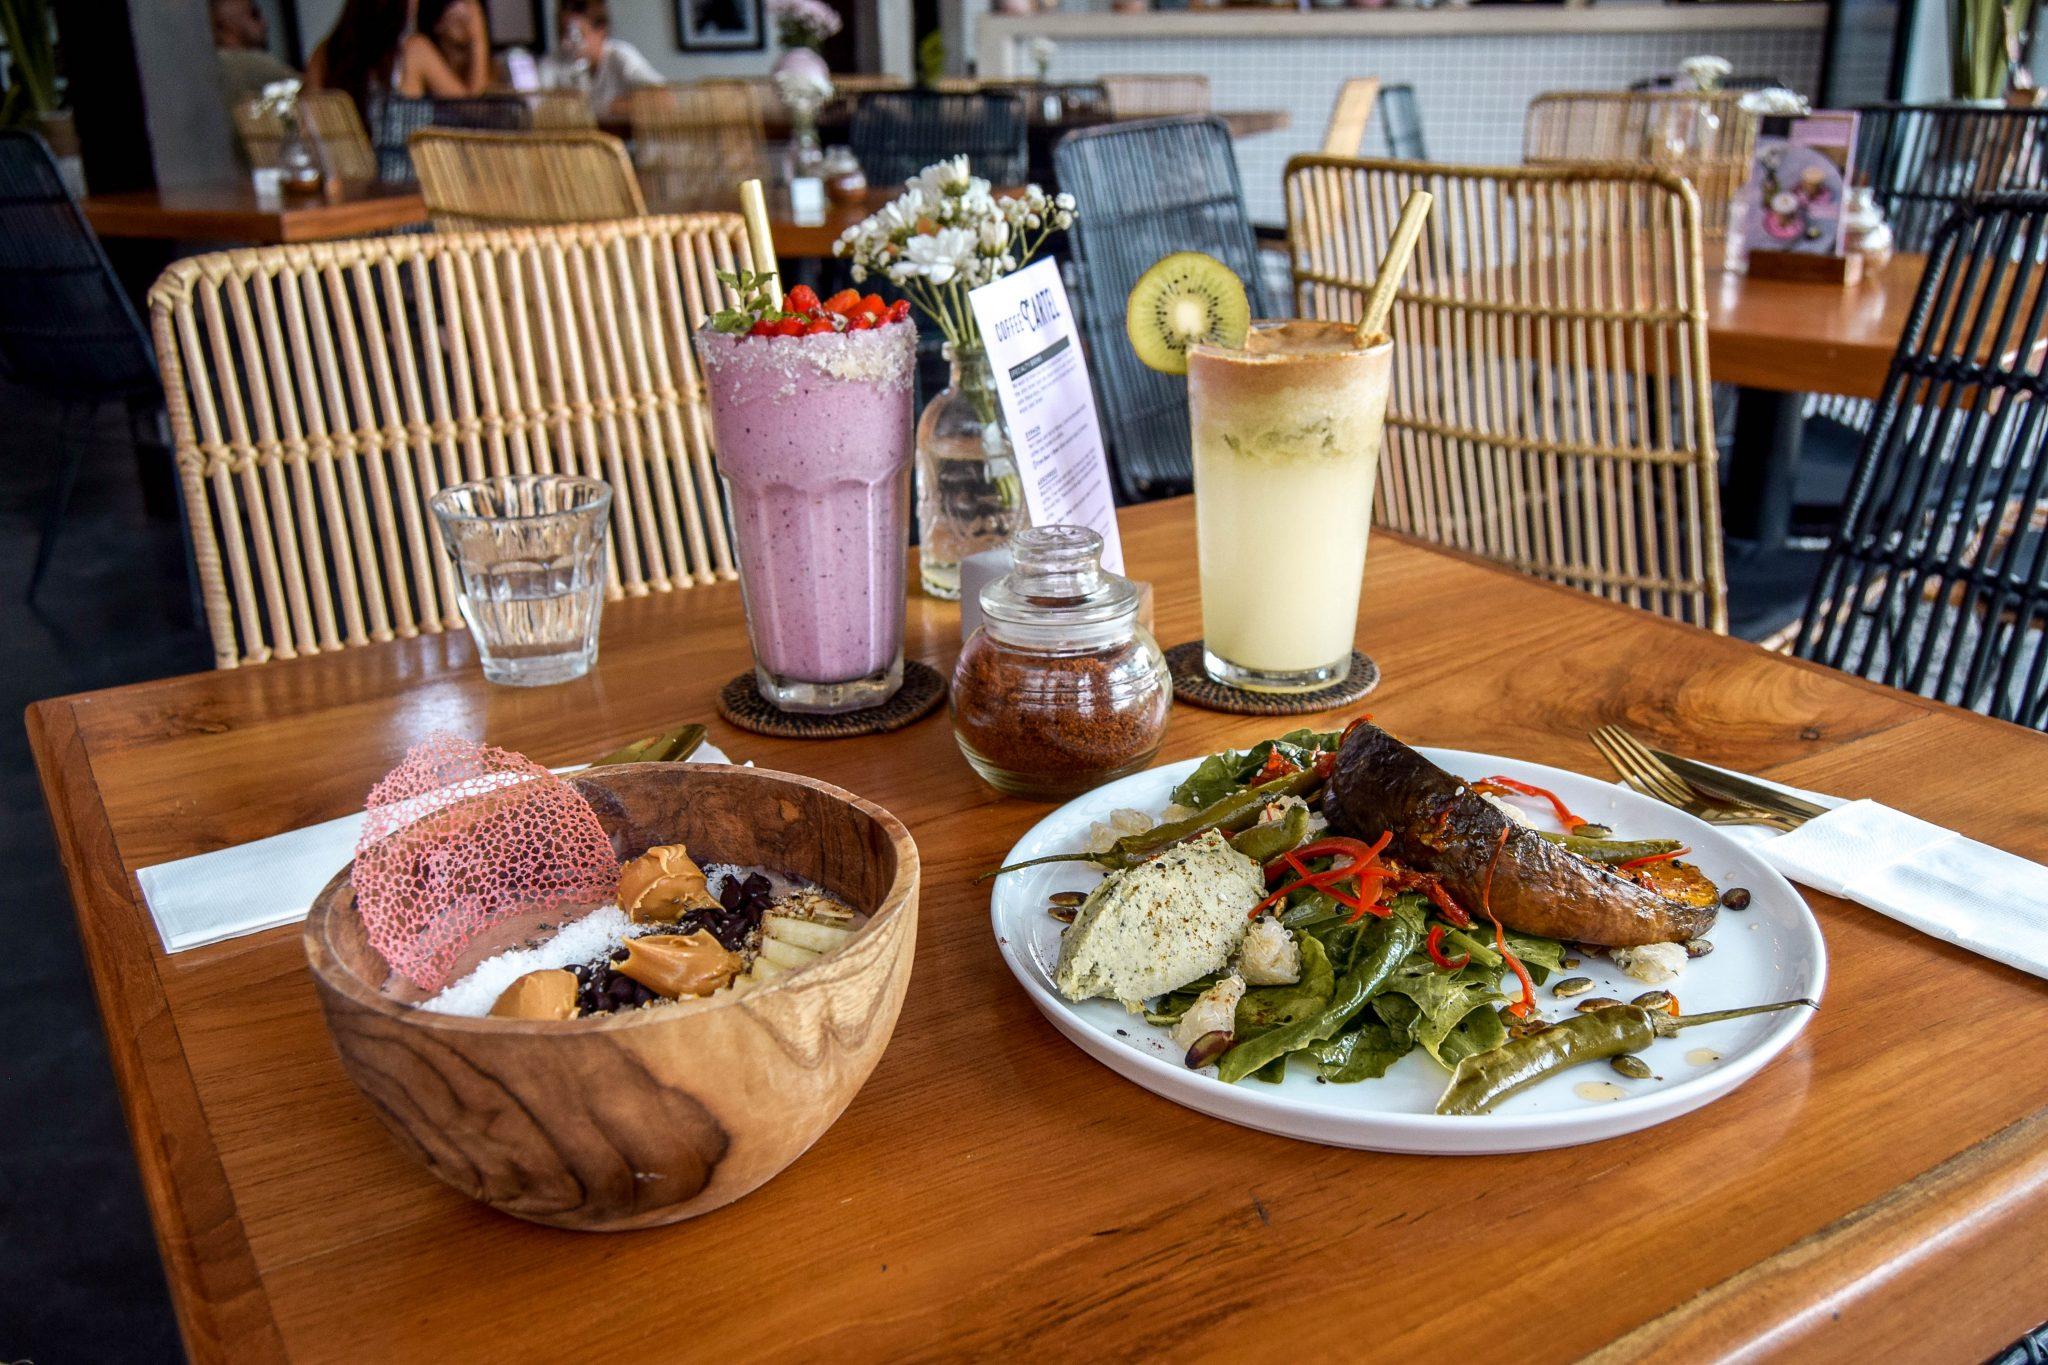 Wanderers & Warriors - Coffee Cartel Bali - Best Restaurants In Bali Restaurants - Best Restaurants In Seminyak